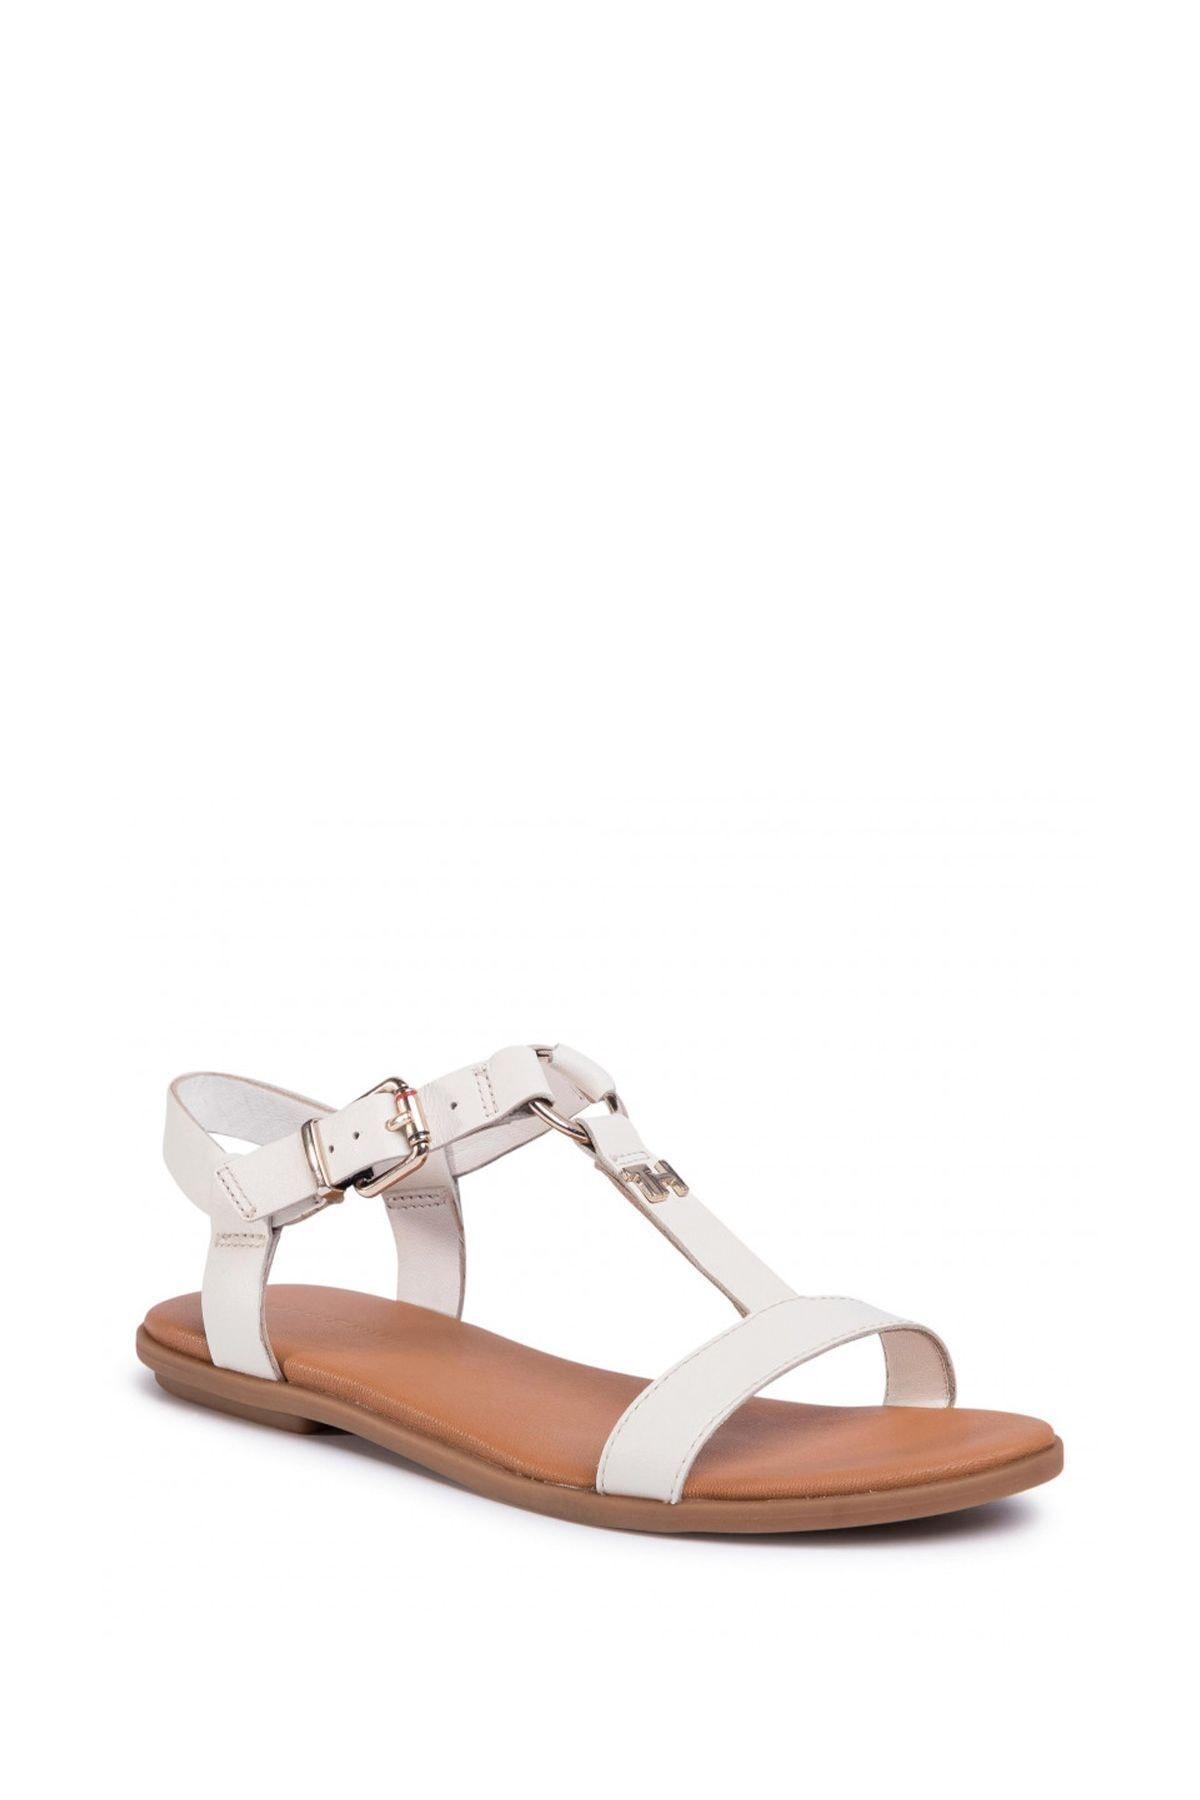 Tommy Hilfiger Kadın Ekru Feminine Leather Flat Sandalet Fw0fw04882 1